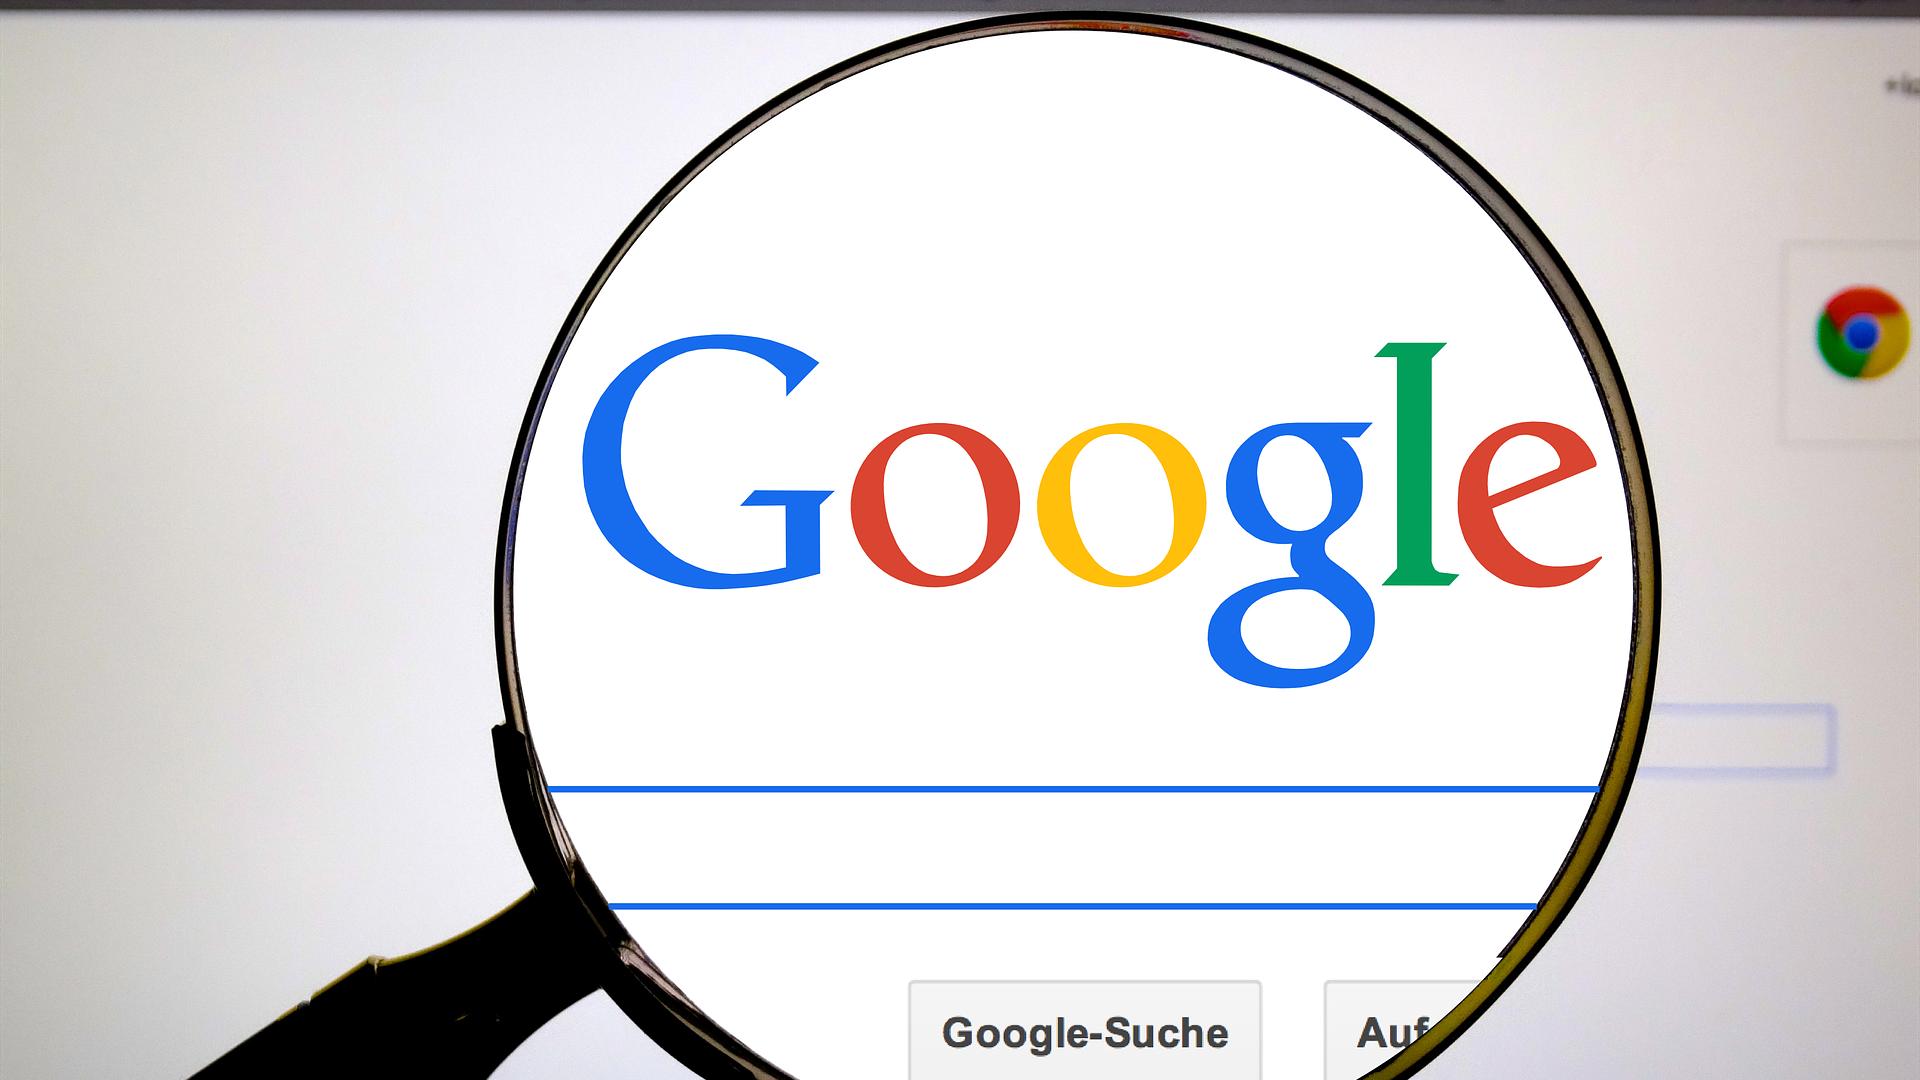 Google (Symbolfoto) - SNA, 1920, 08.07.2021